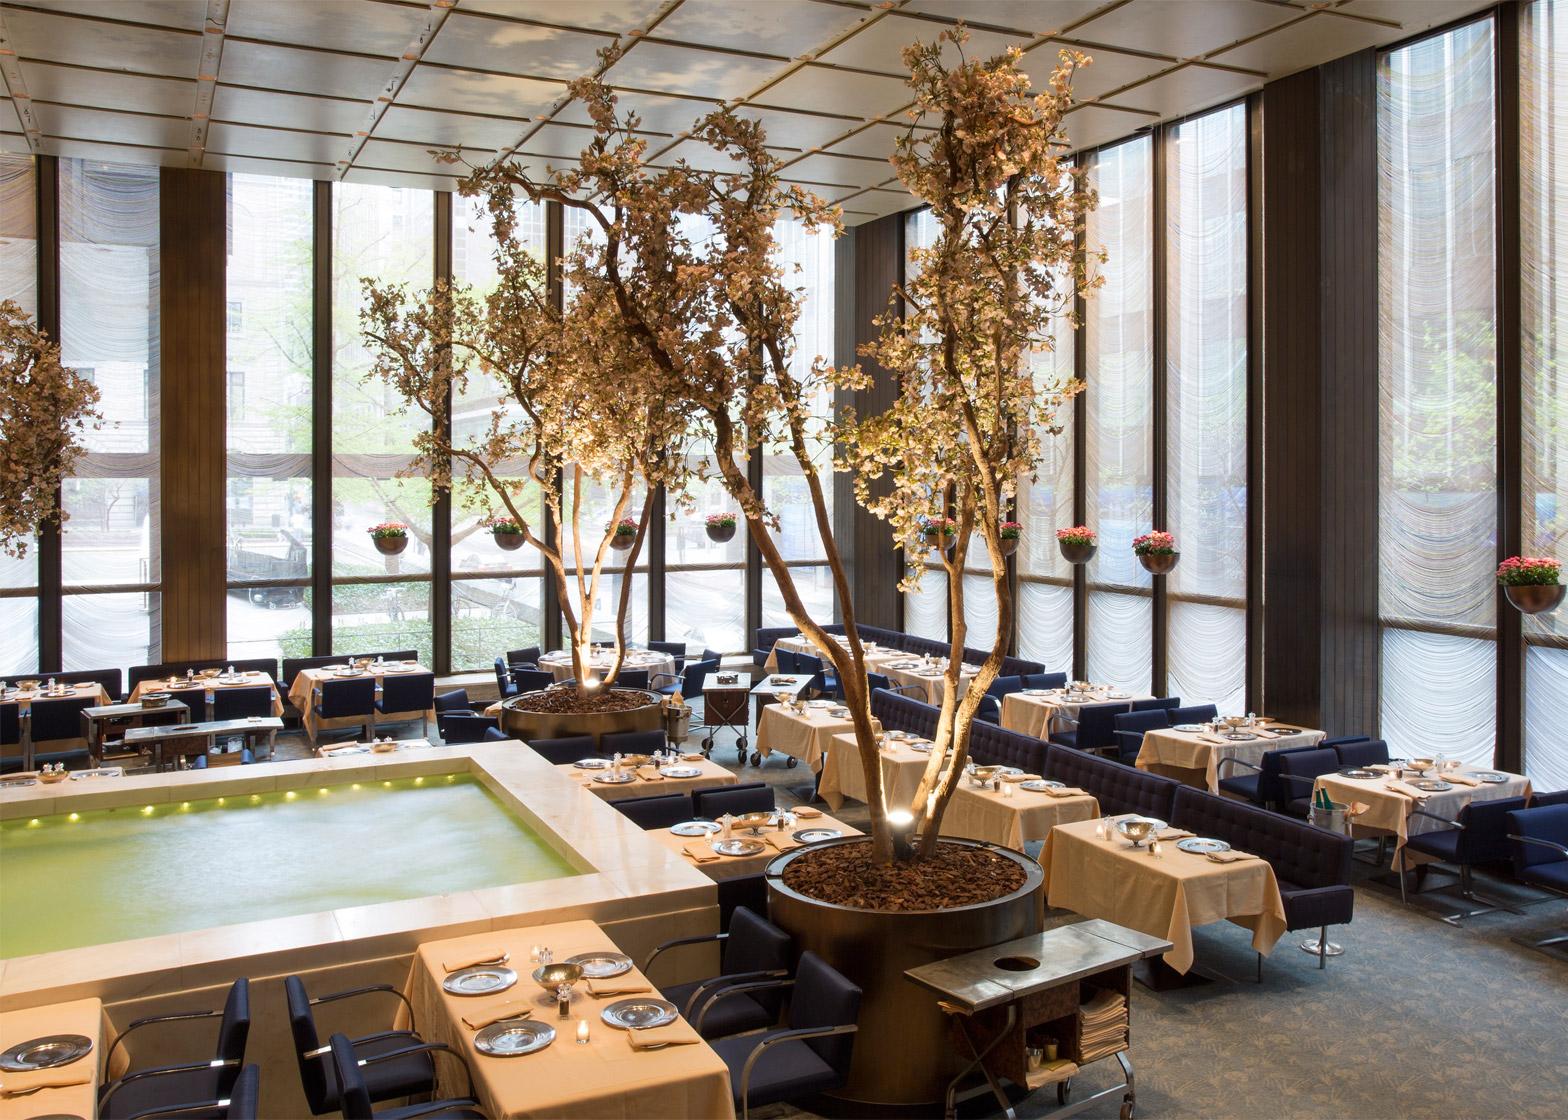 four-seasons-restaurant-interior-seagram-building-philip-johnson-mies-van-der-rohe-auction-new-york-city-usa-news_dezeen_1568_3